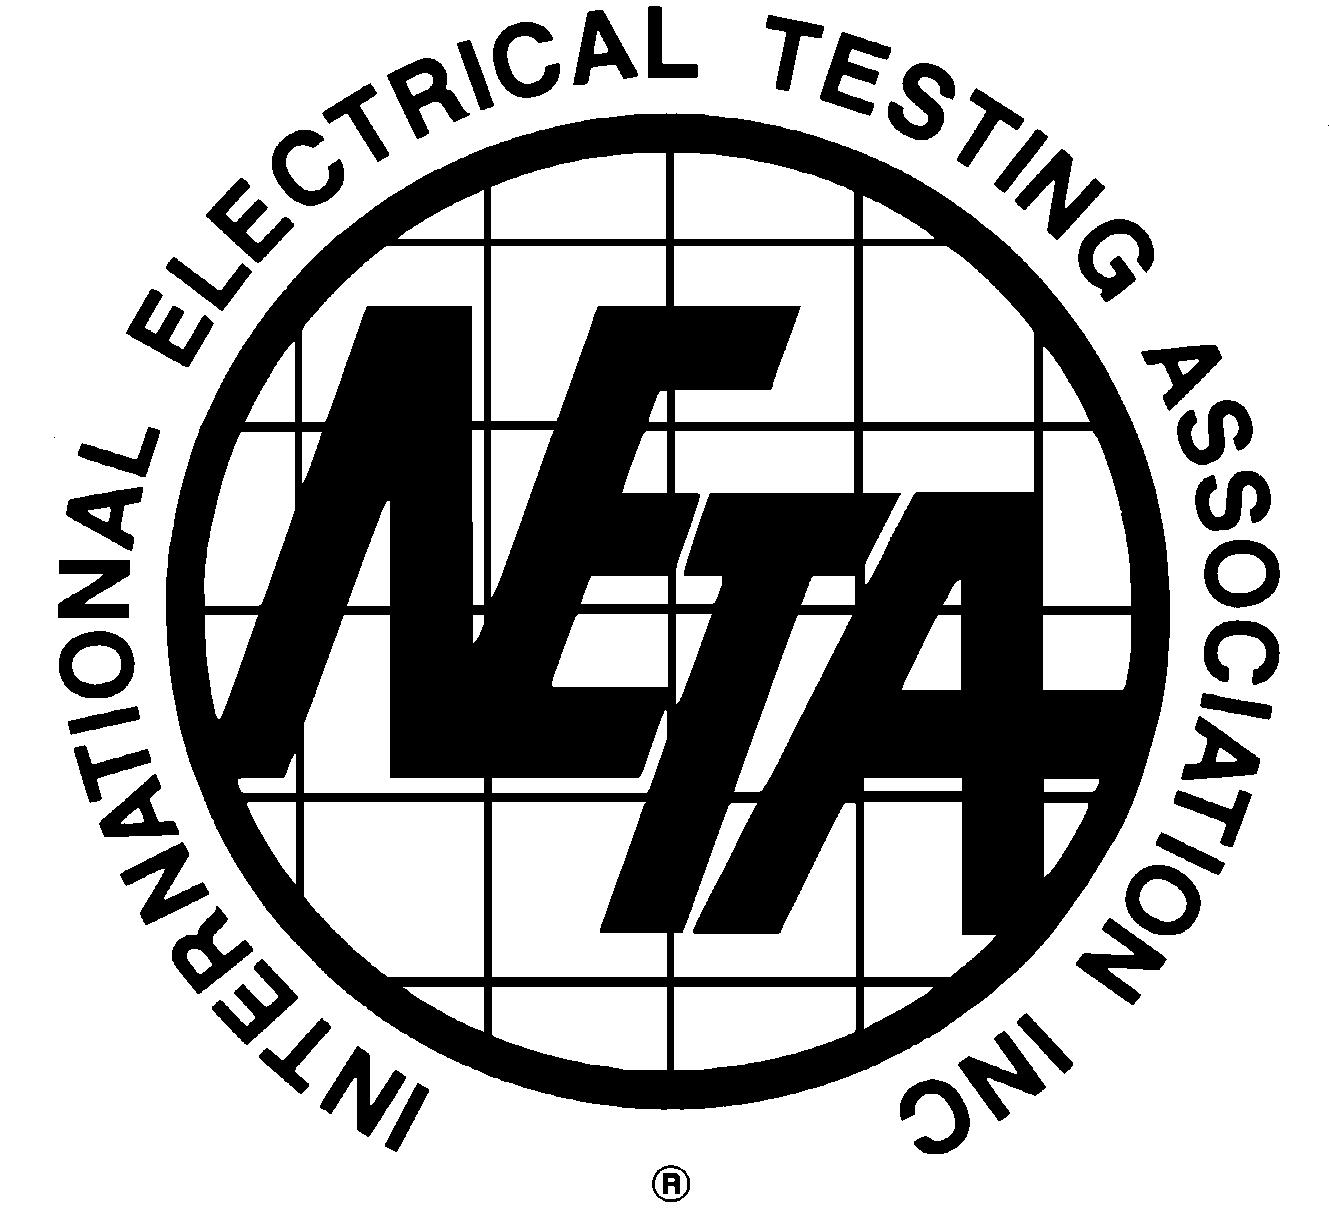 NETA Certifications